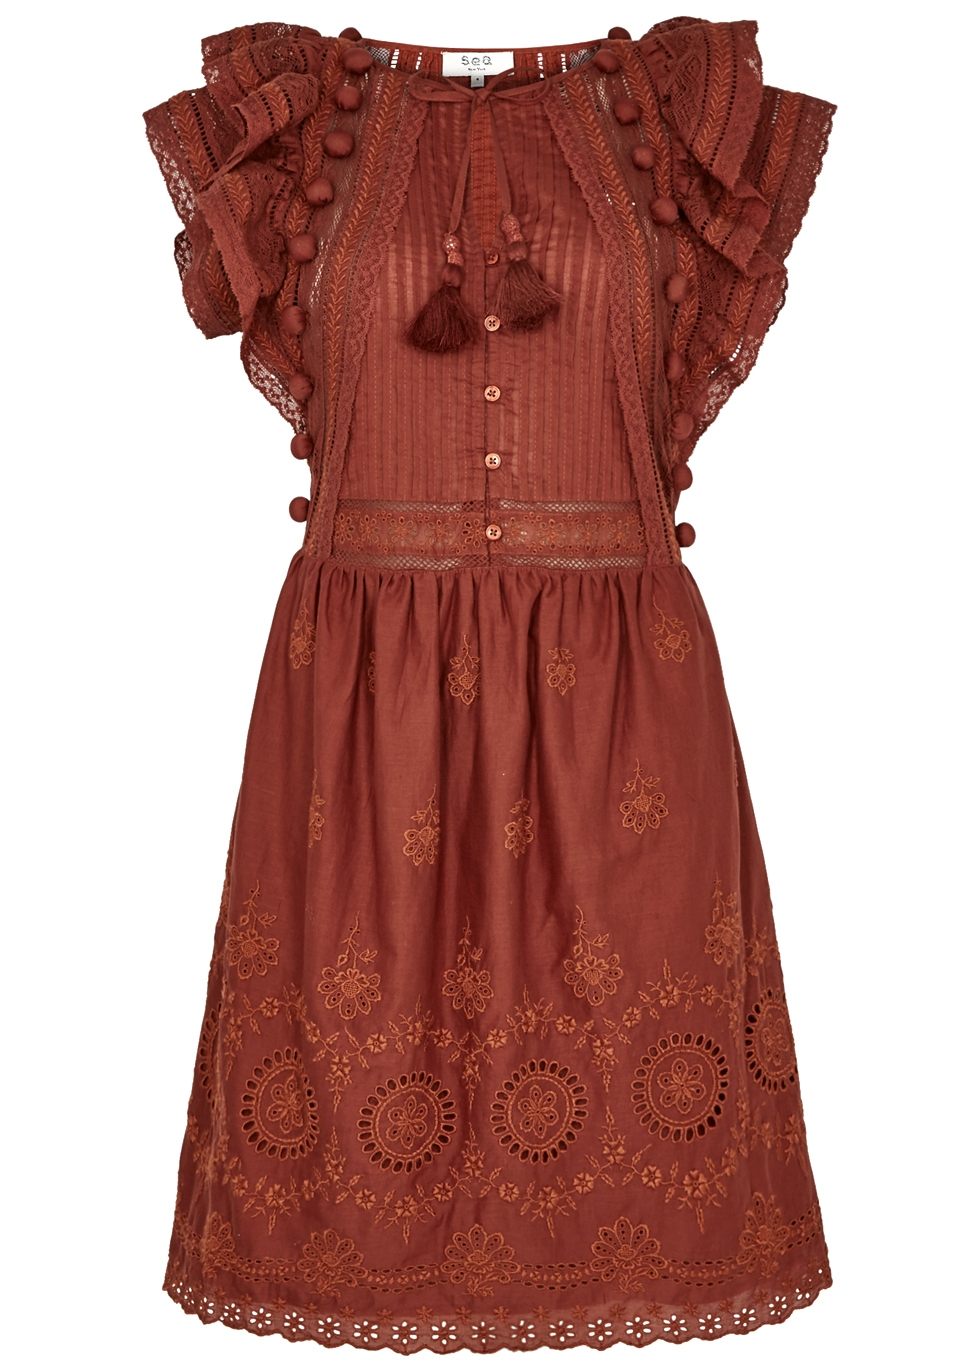 SEA NY SOFIE EMBROIDERED COTTON DRESS